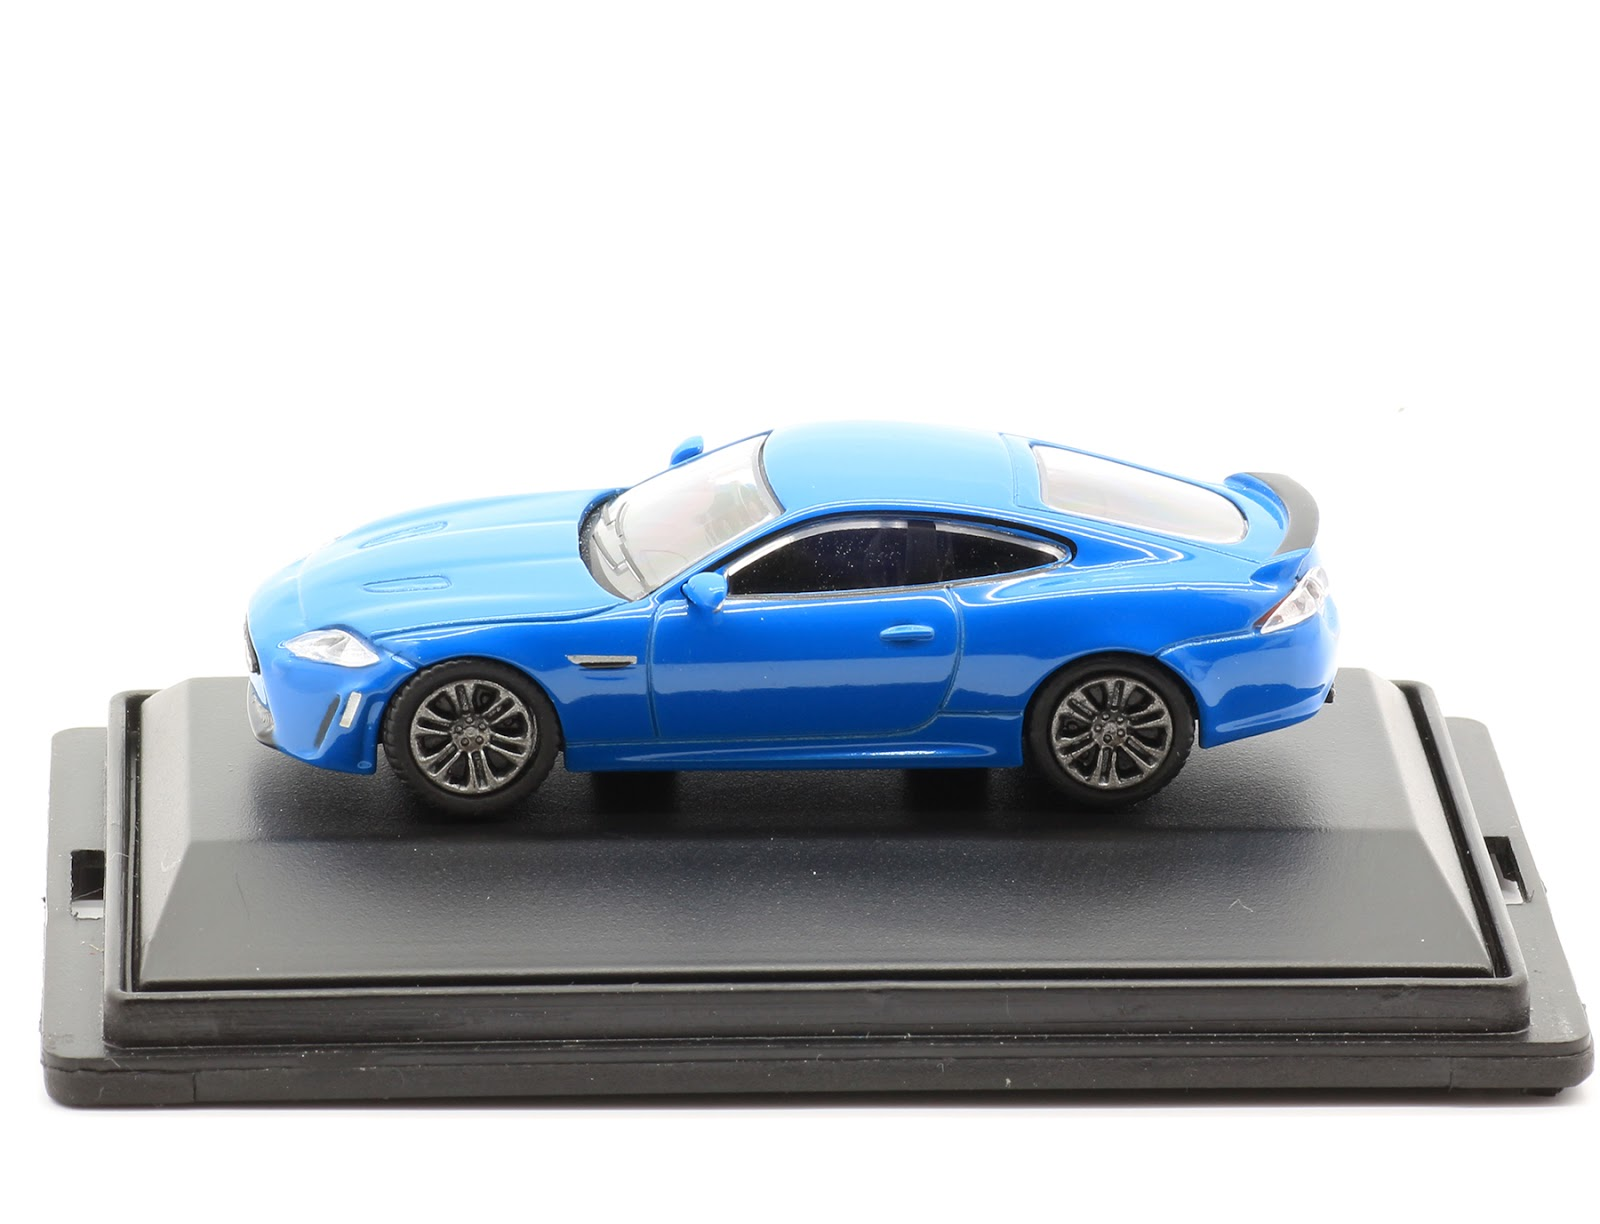 Incredible Mini Garage Jaguar Xkr S 2013 Oxford 1 76